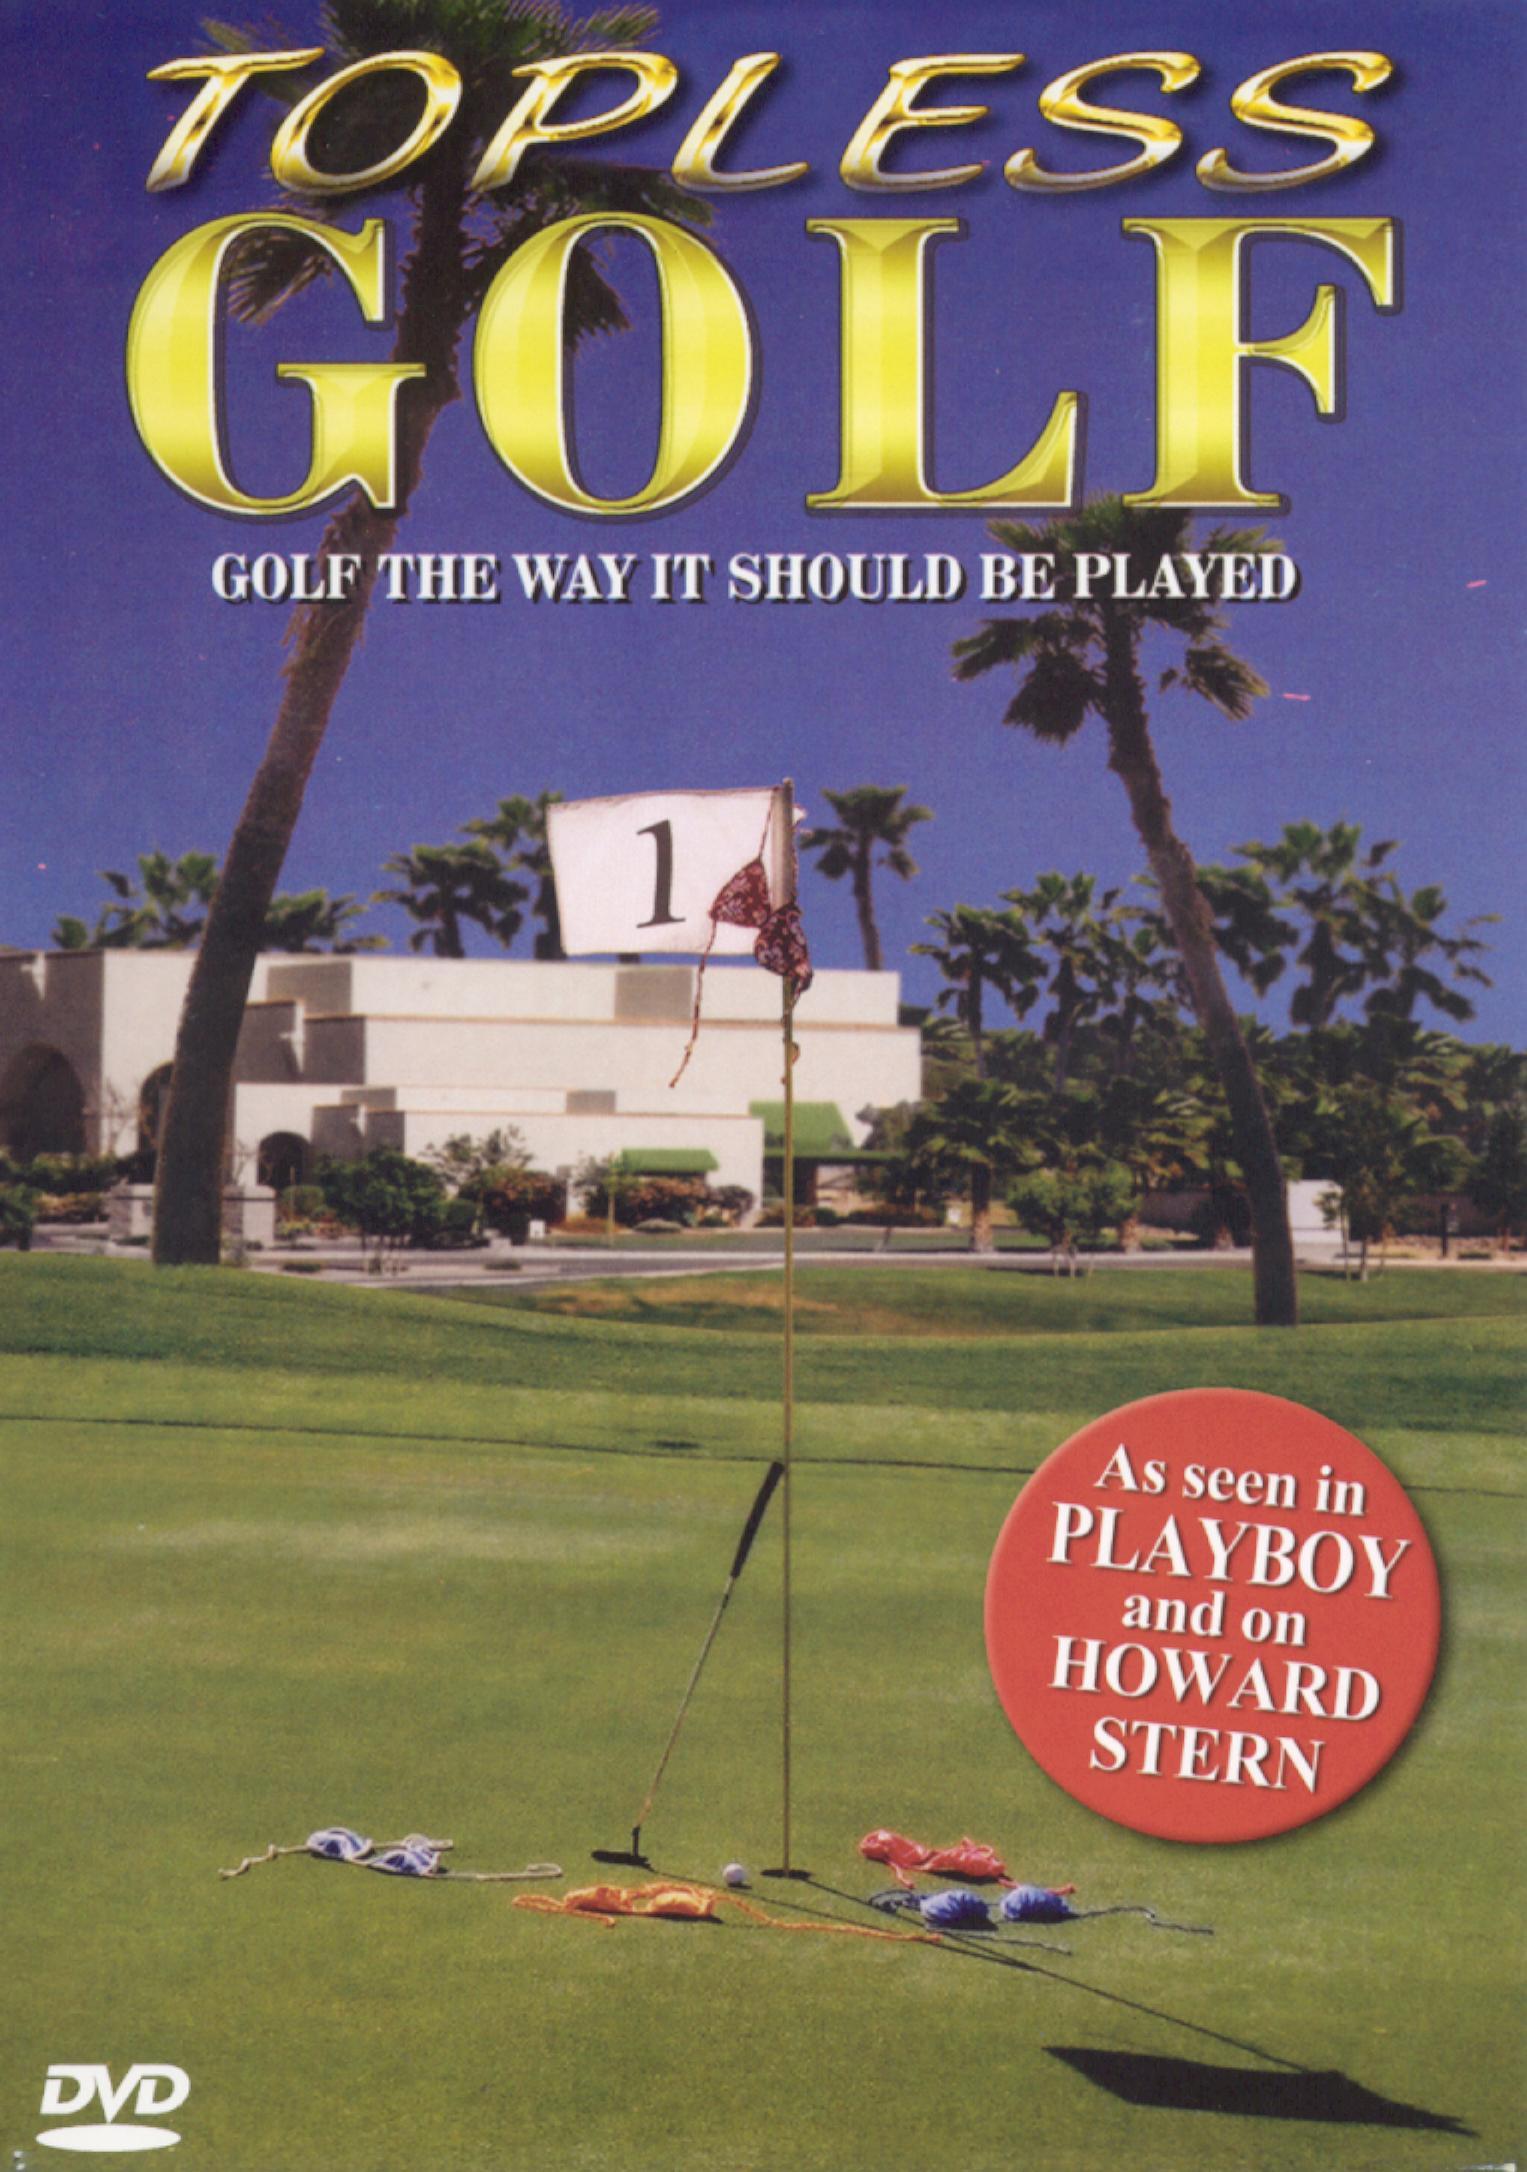 Topless Golf, Round 1